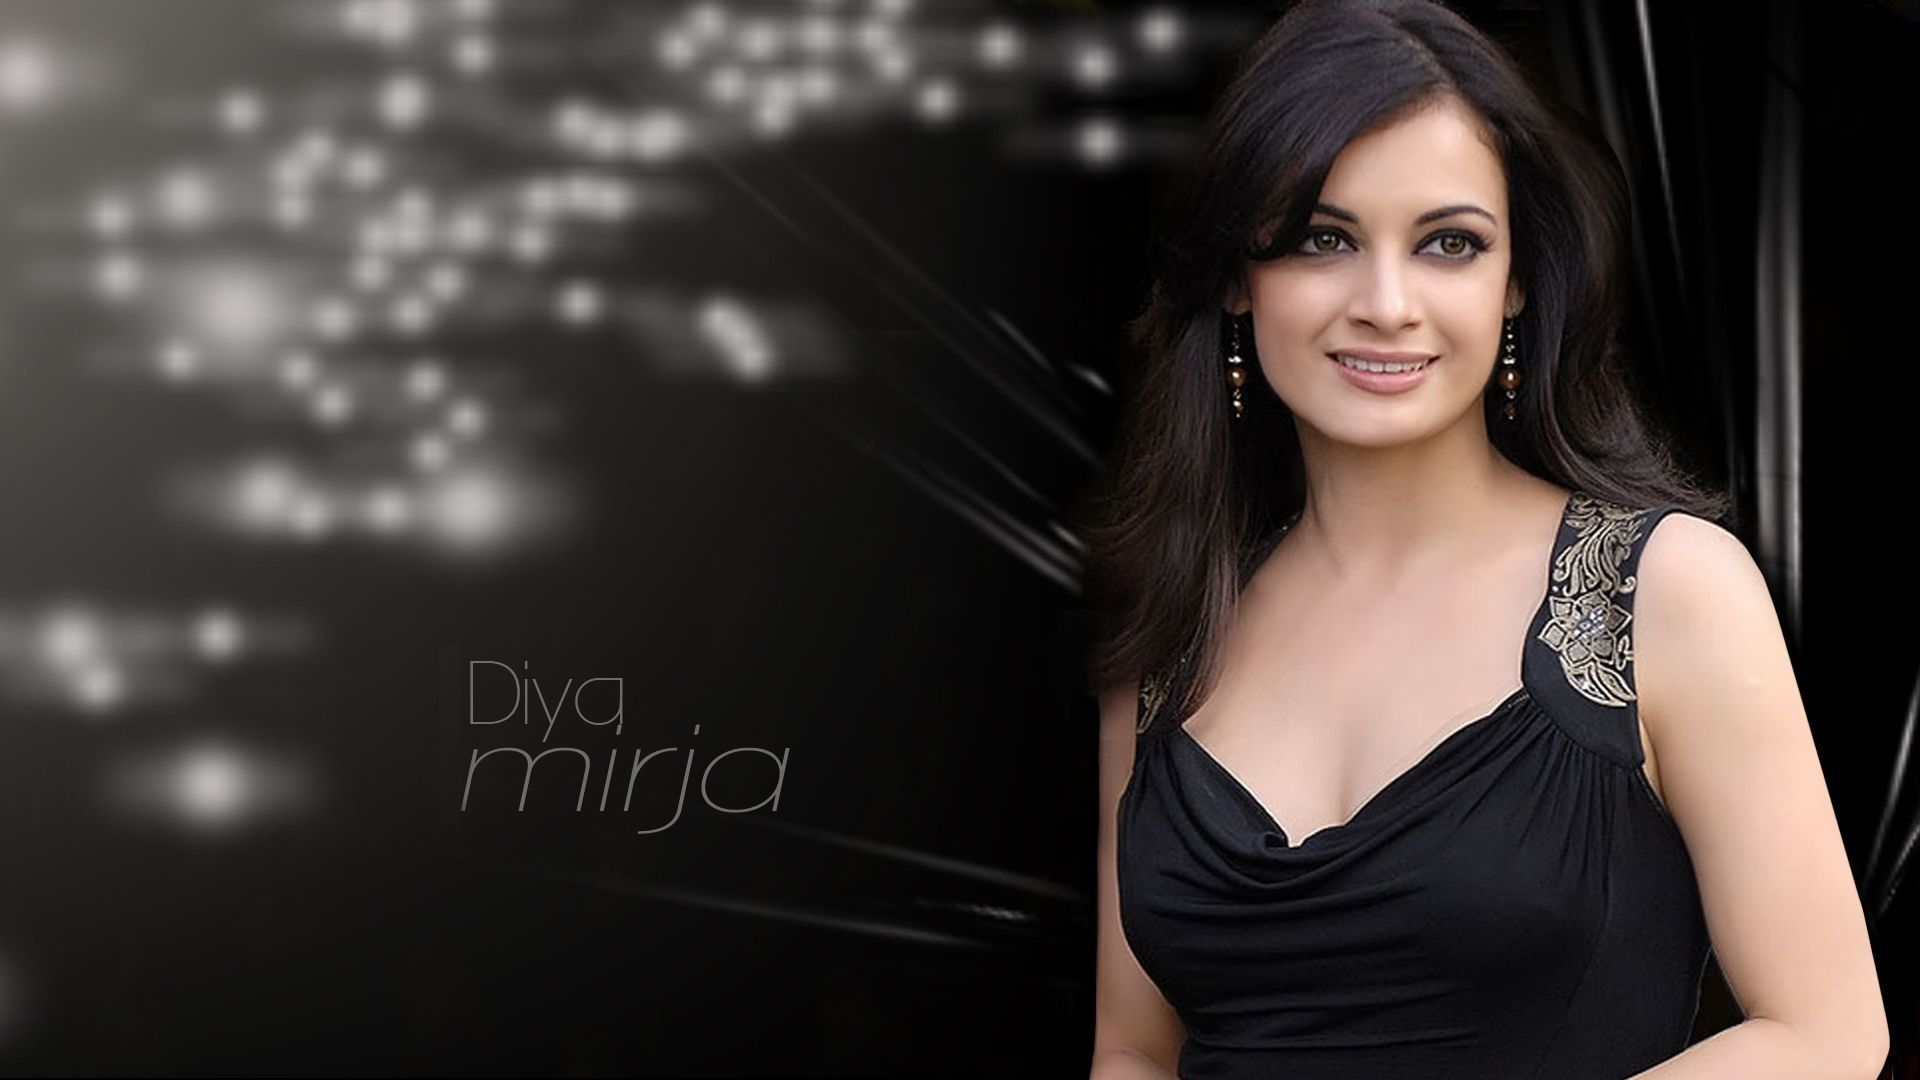 Full Hd Wallpapers Bollywood Actress: 1920x1080 Bollywood Actress Hd Wallpapers 1080p Diya Mirja